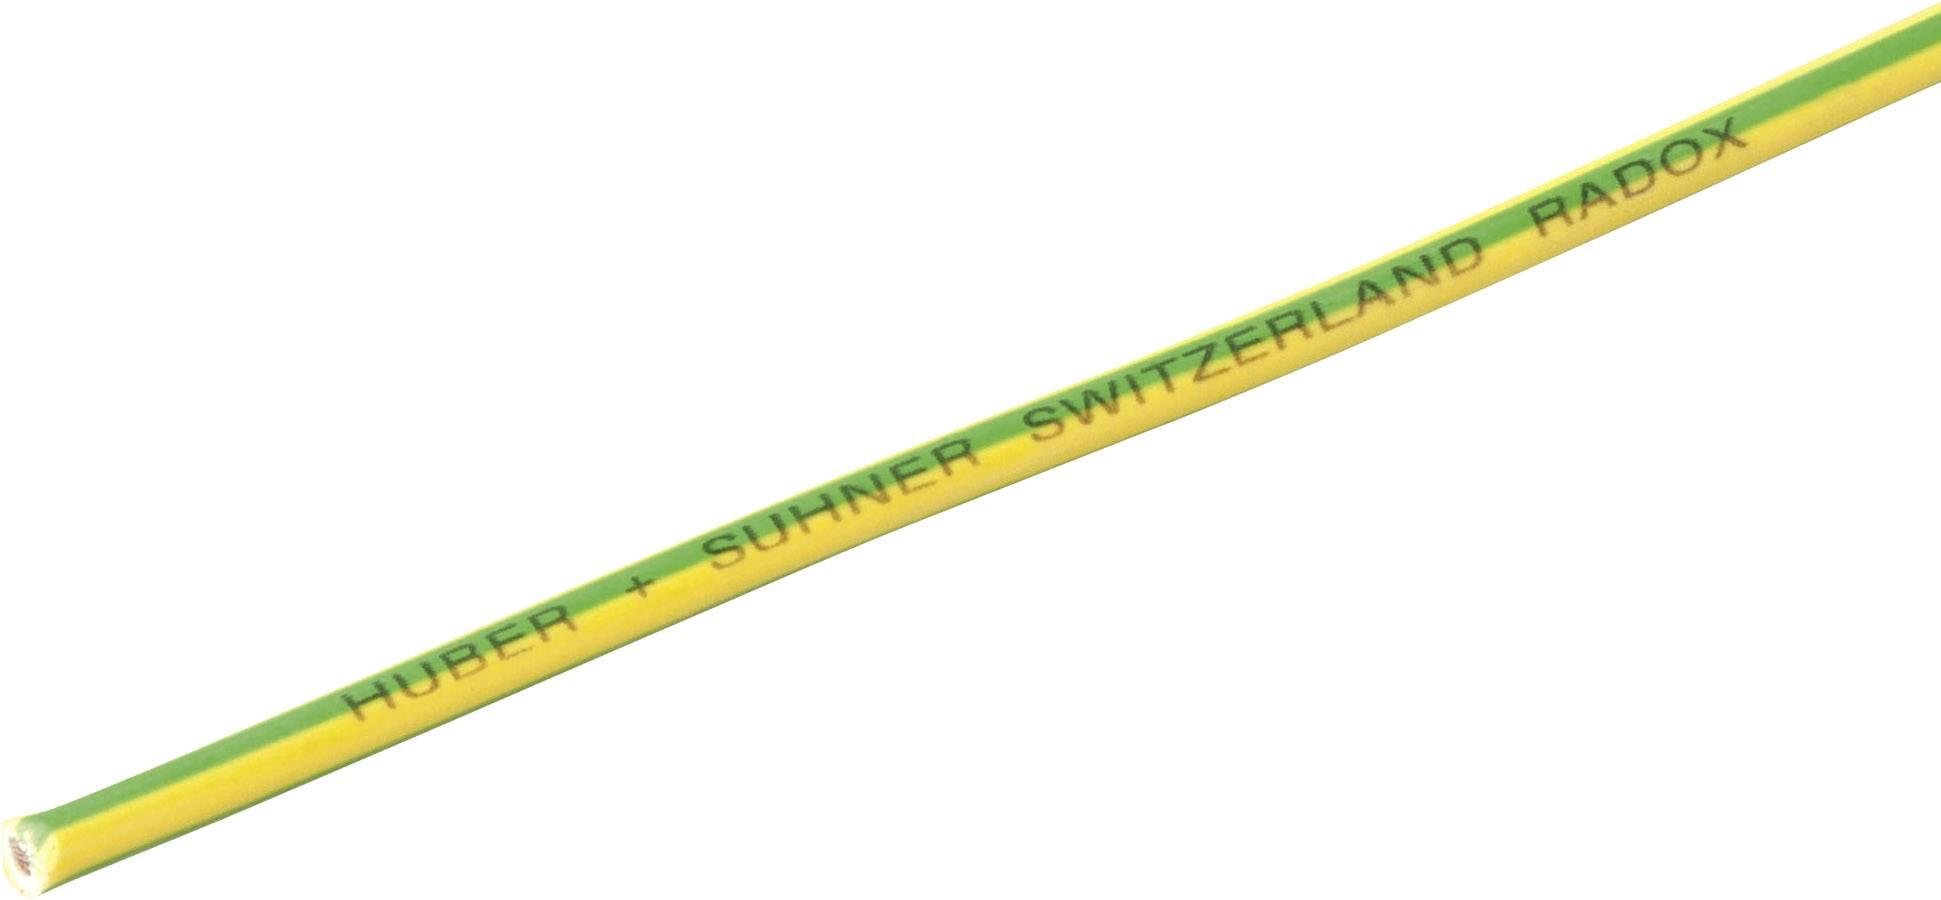 Opletenie / lanko Huber & Suhner 12420125 Radox® 155, 1 x 4 mm², vonkajší Ø 4.20 mm, metrový tovar, zelenožltá